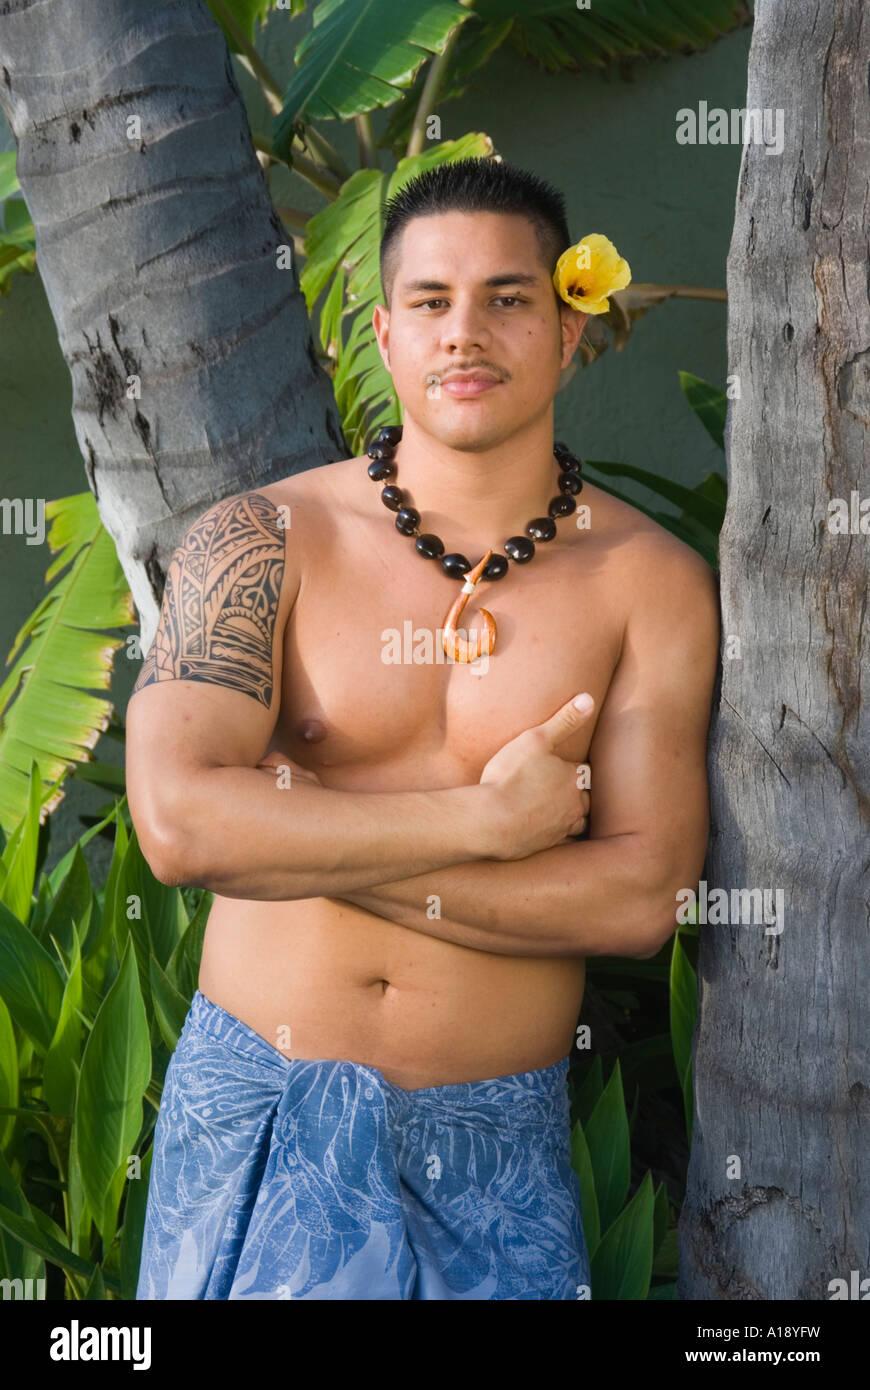 dating en Hawaiian mann Santiago Douglas dating